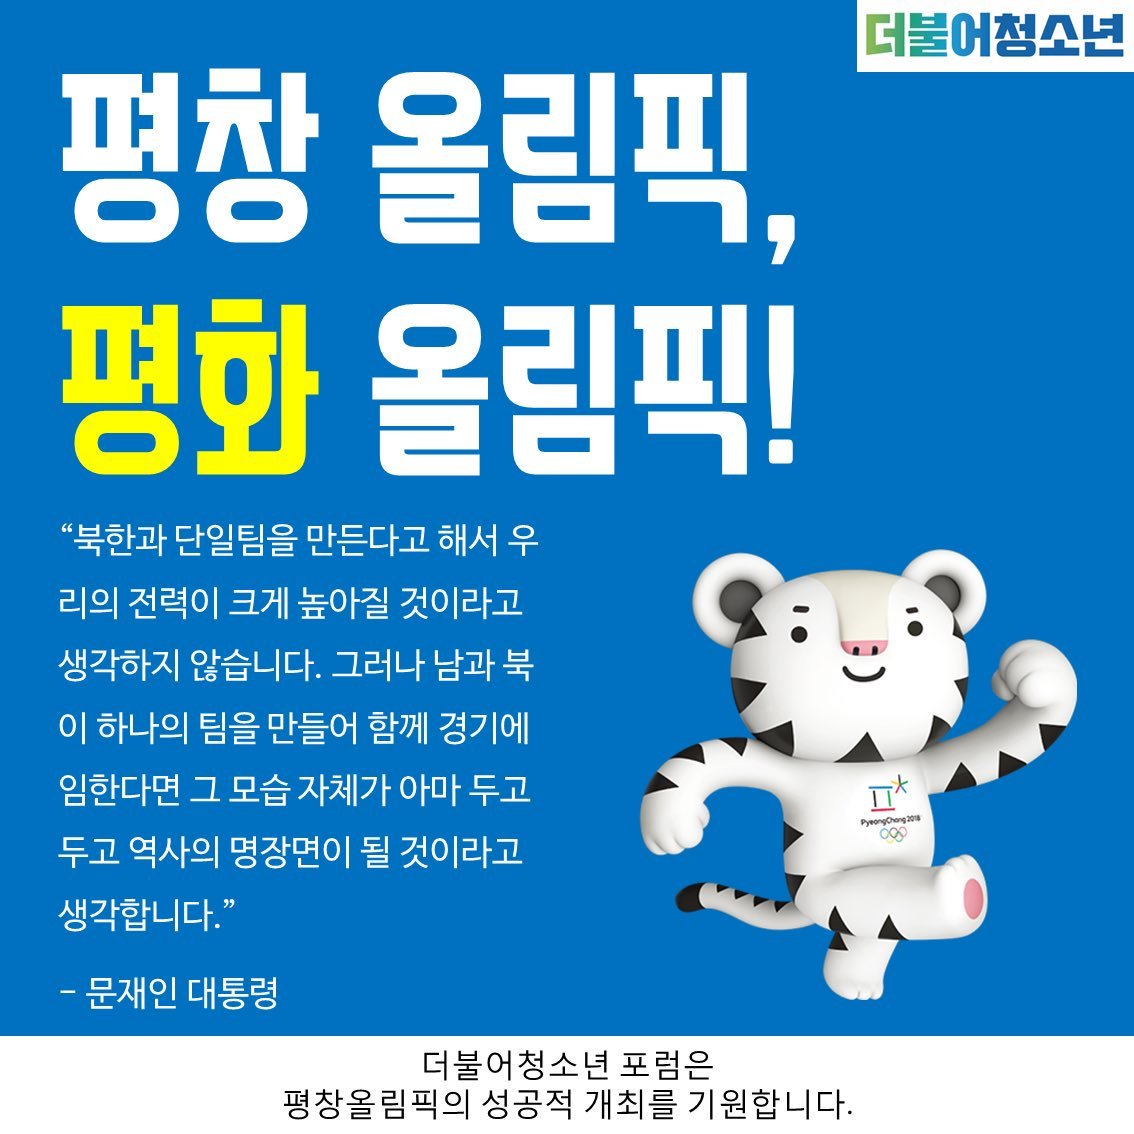 RT @forumwithteen: 더불어청소년 포럼은 #평창올림픽 의 성공적 개최를 기원합니다.💙 #평화올림픽 https://t.co/QgwlyYFncn